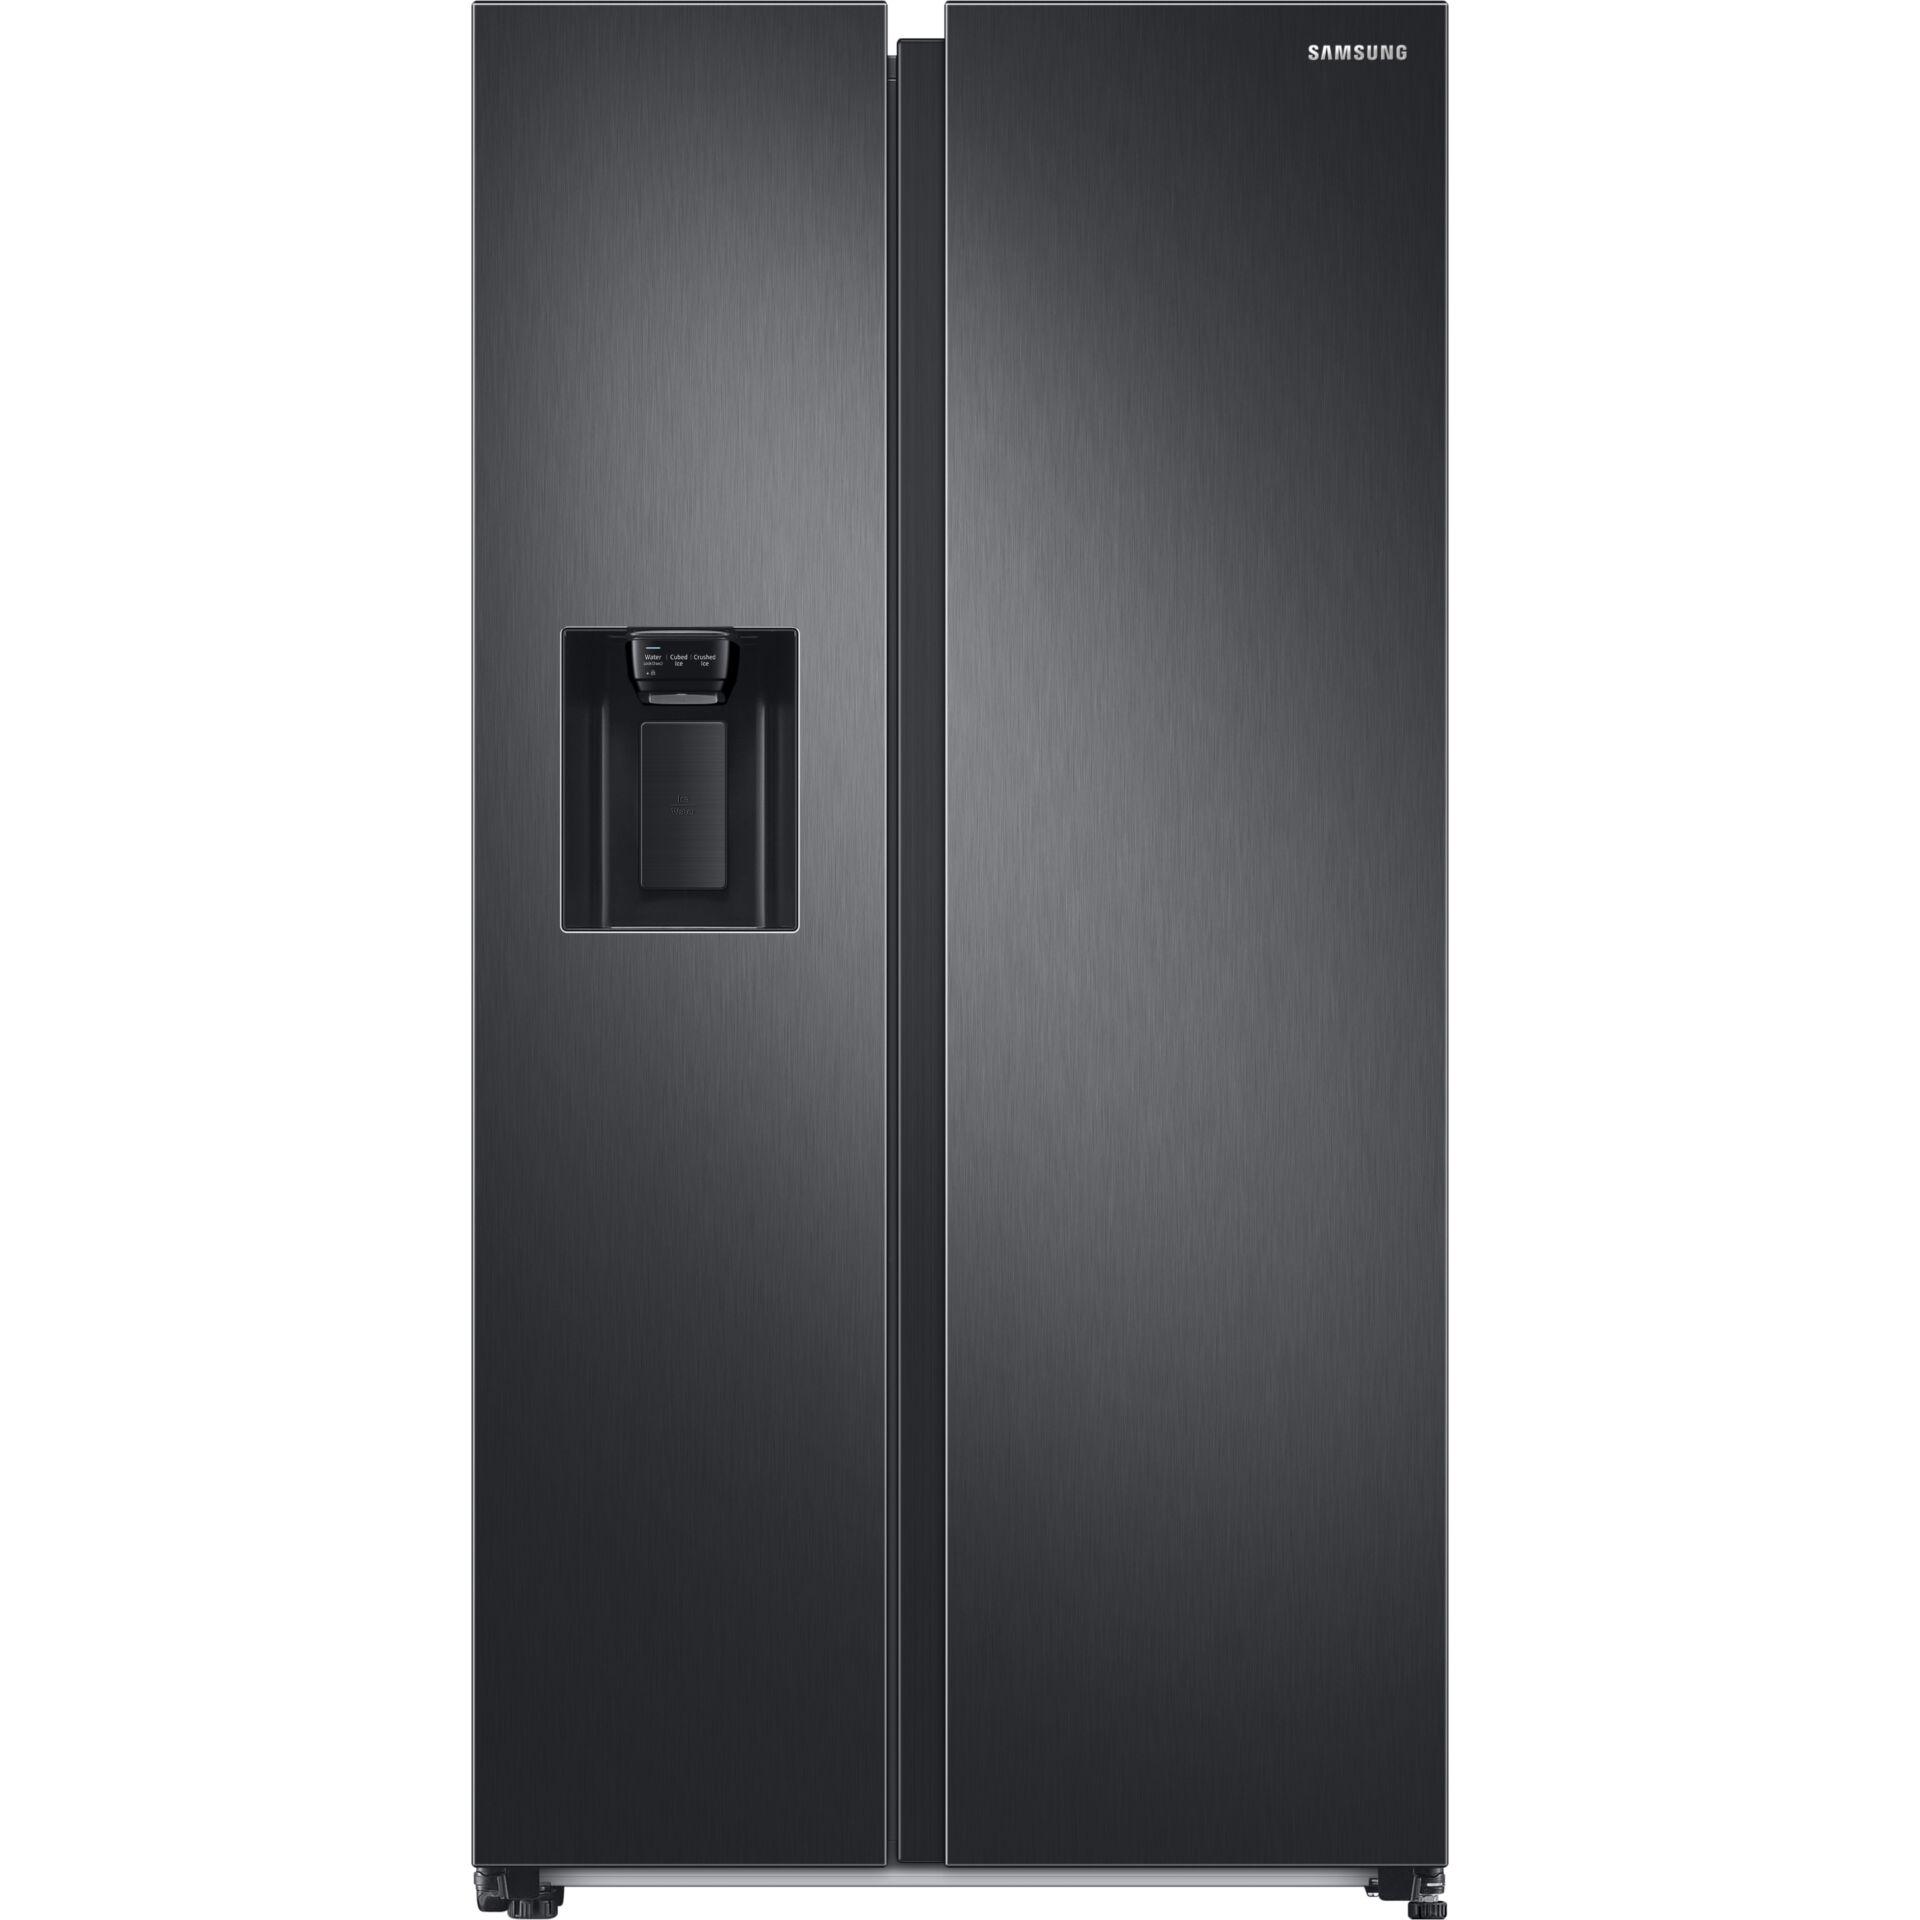 Samsung RS6GA8821B1/EG Side by Side premium black steel